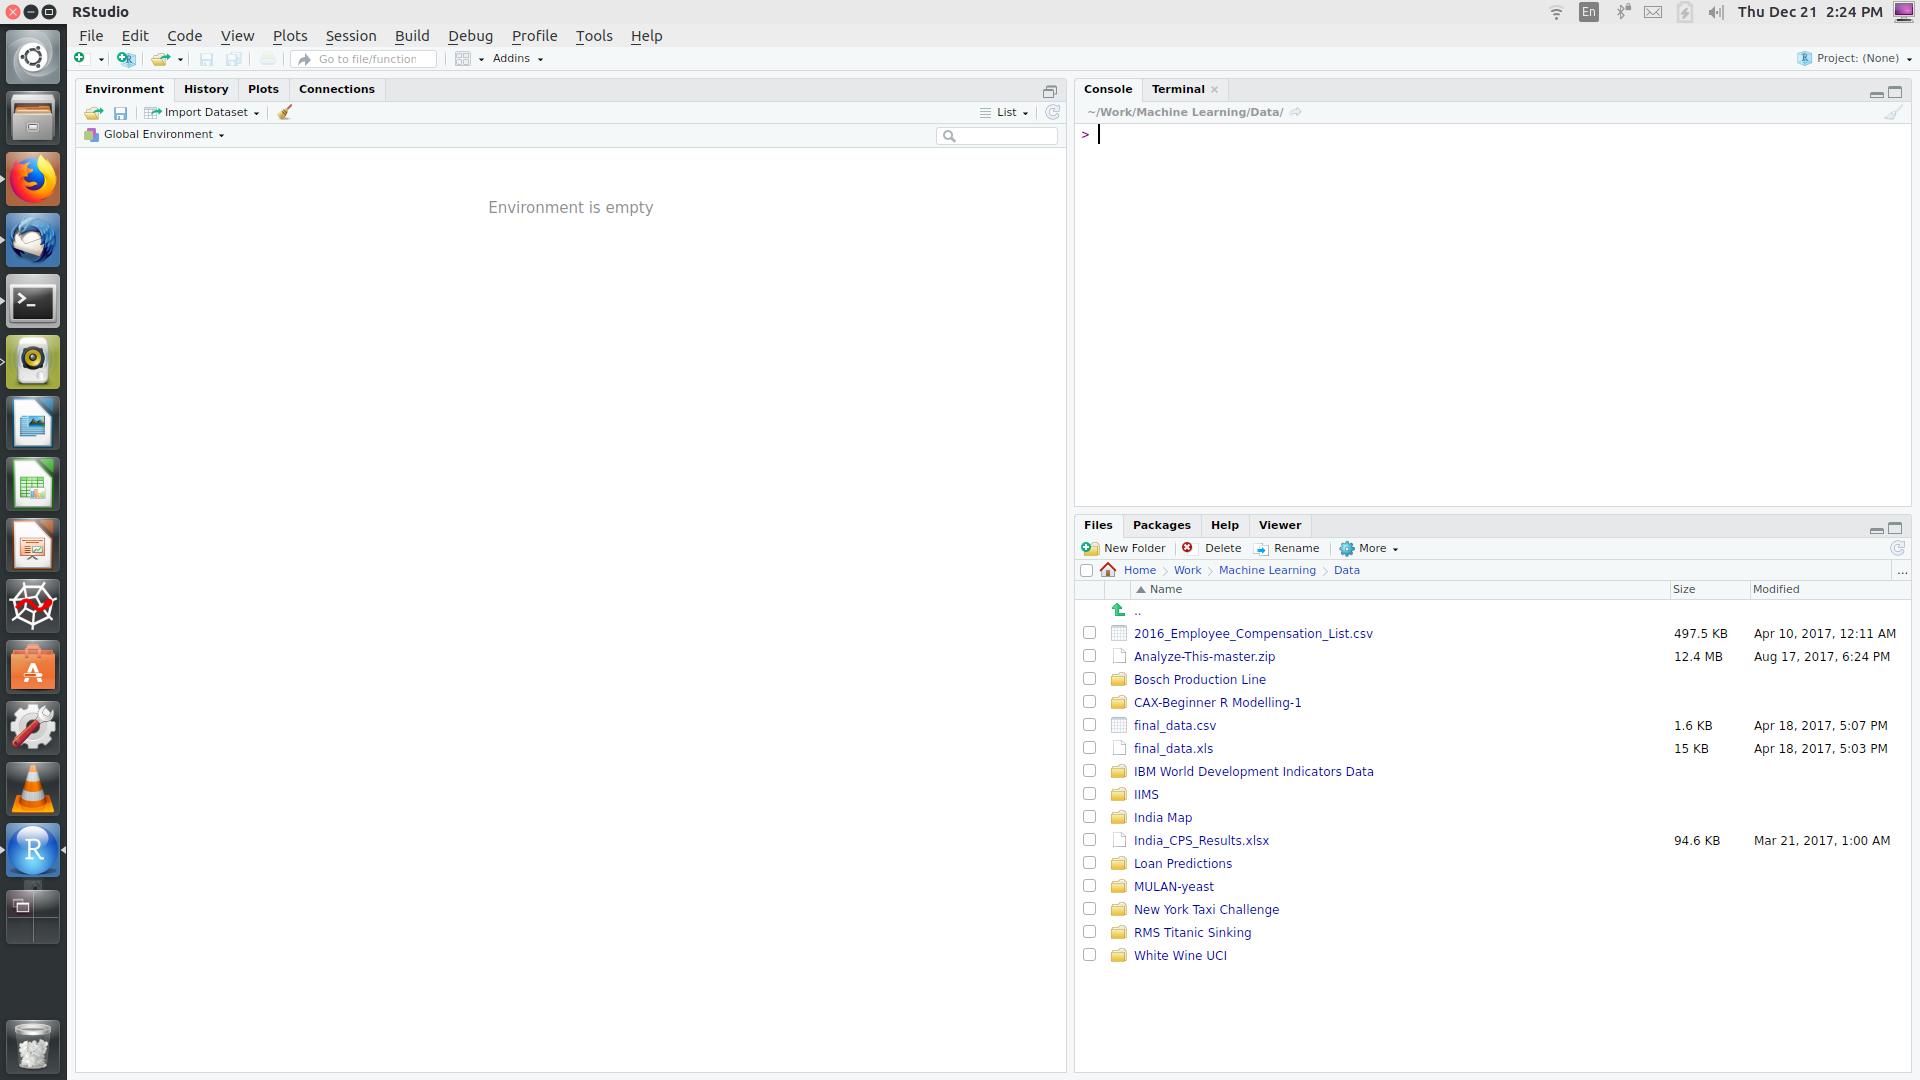 R Studio 1 1 383 for Ubuntu 16 04 - Source Editor not working  Can't